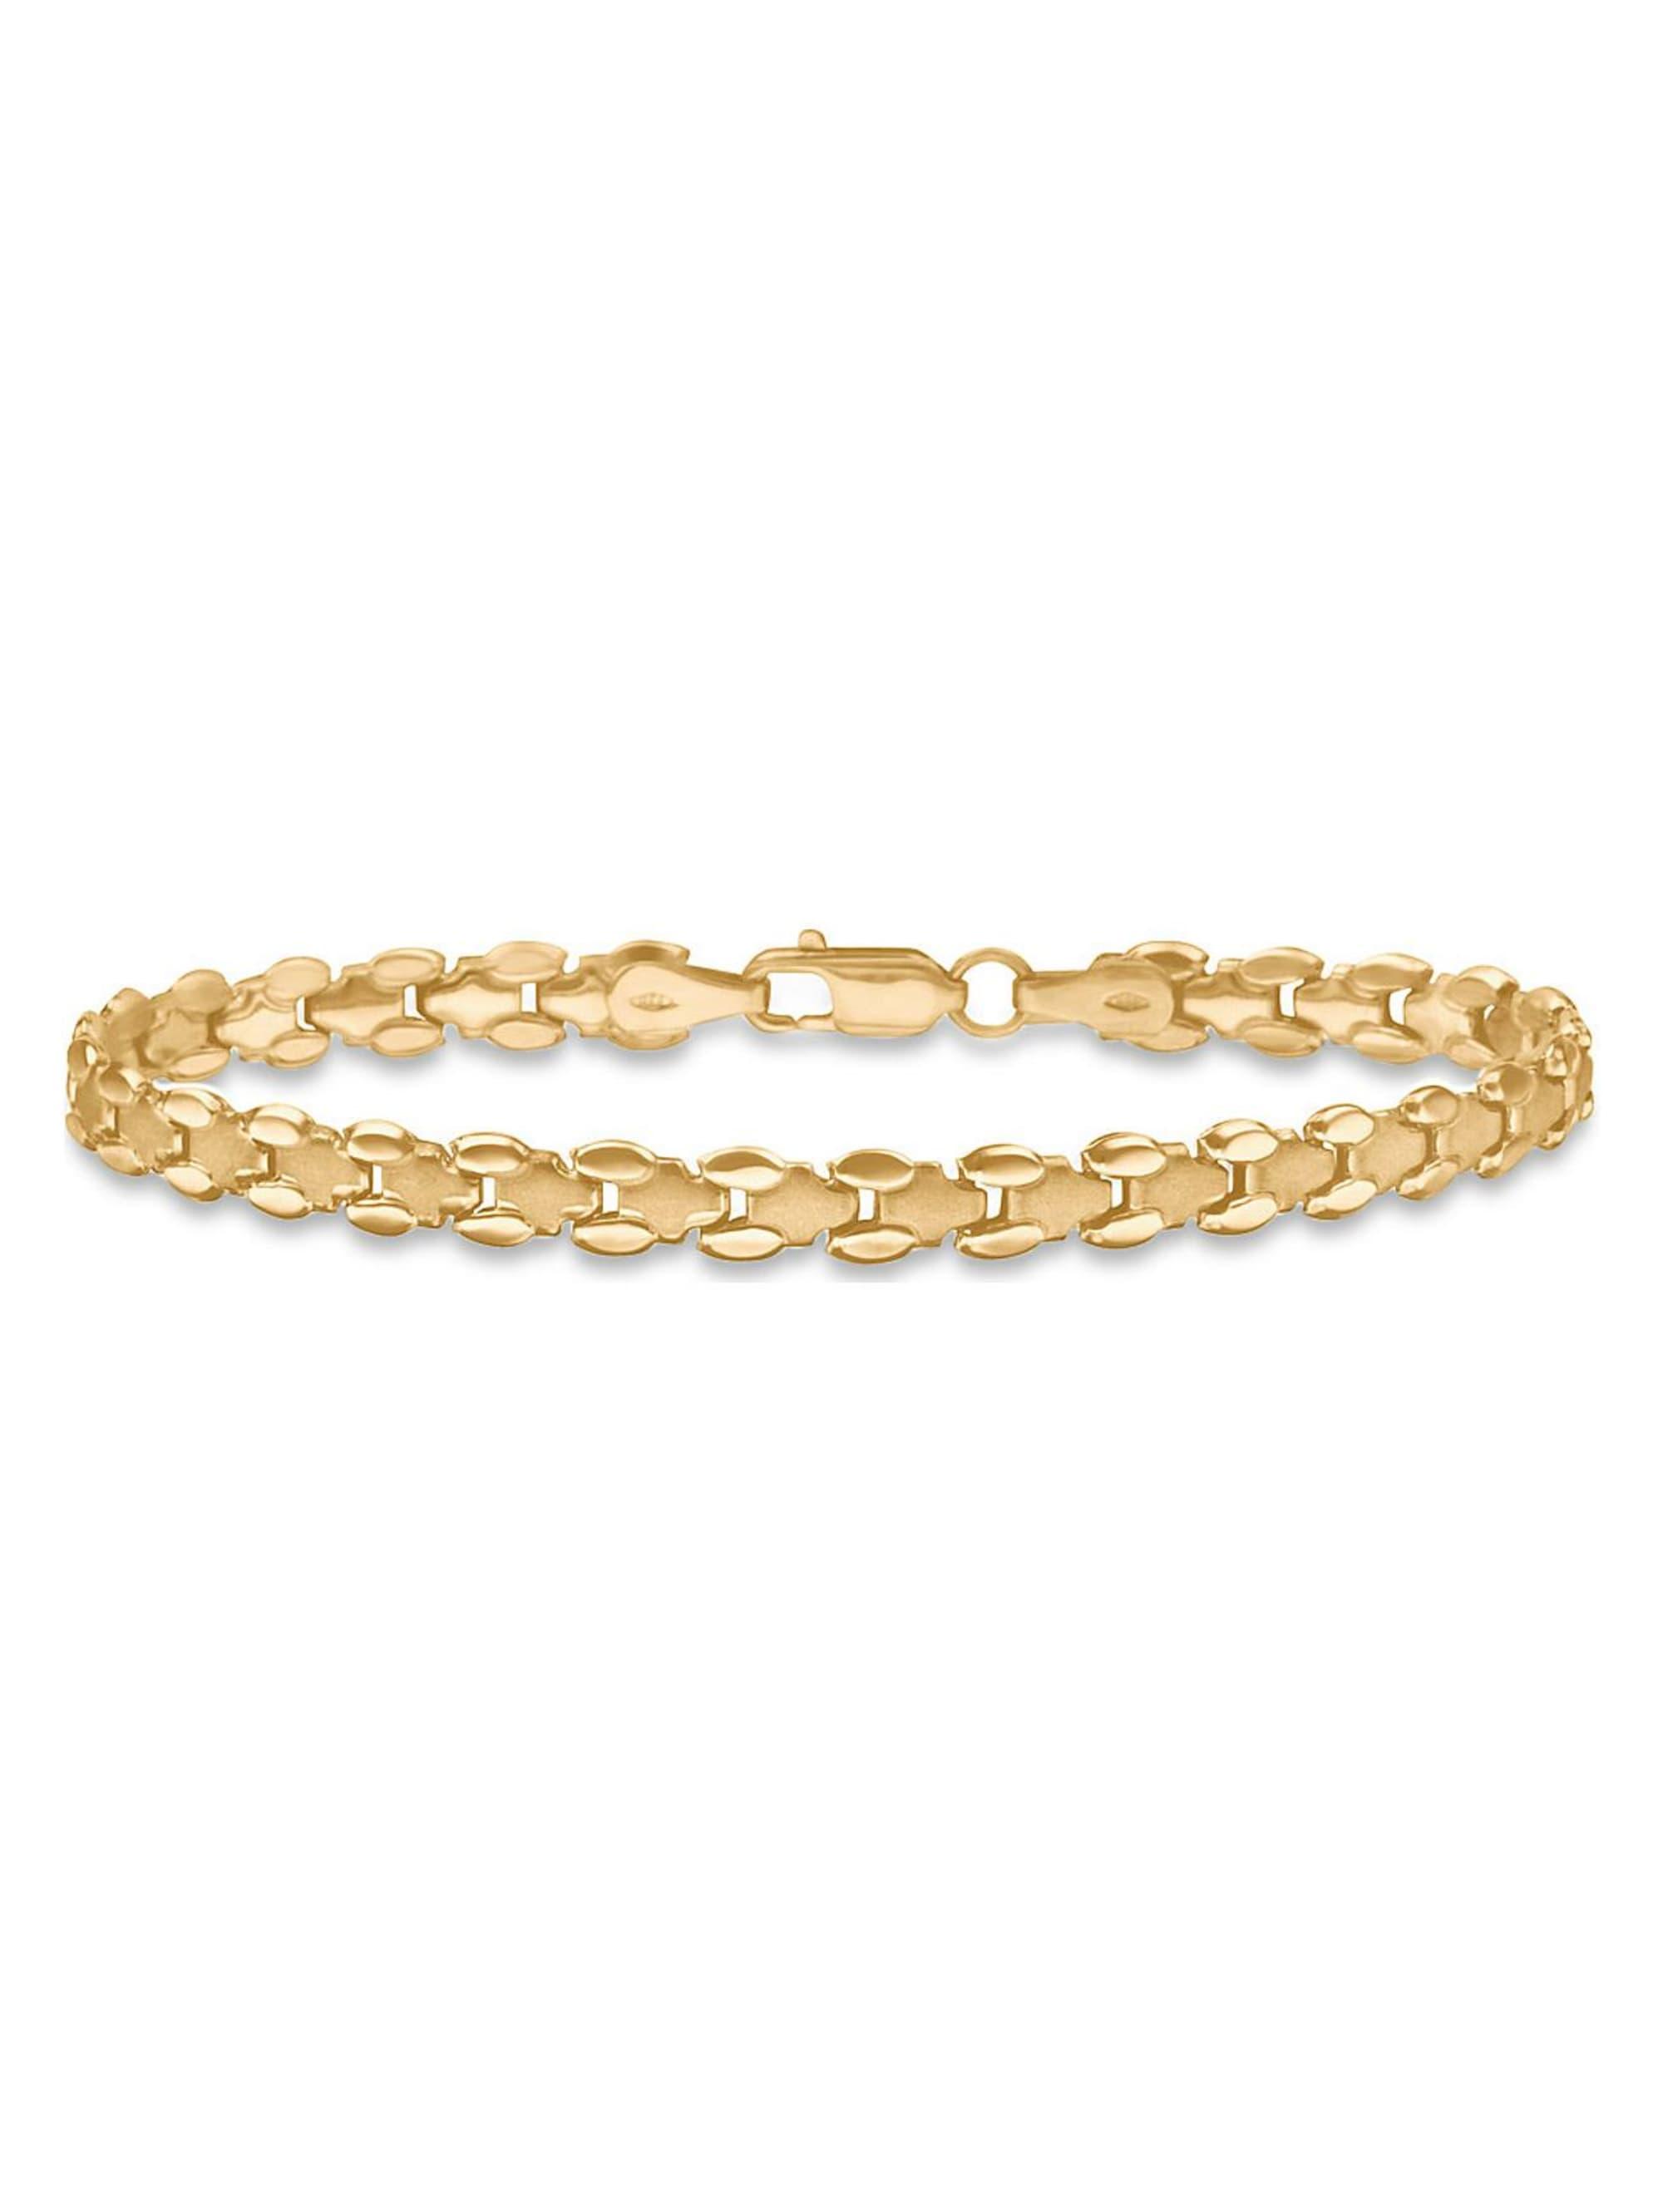 CHRIST GOLD CHRIST Gold Damen-Armband 333er Gelbgold XbUHx